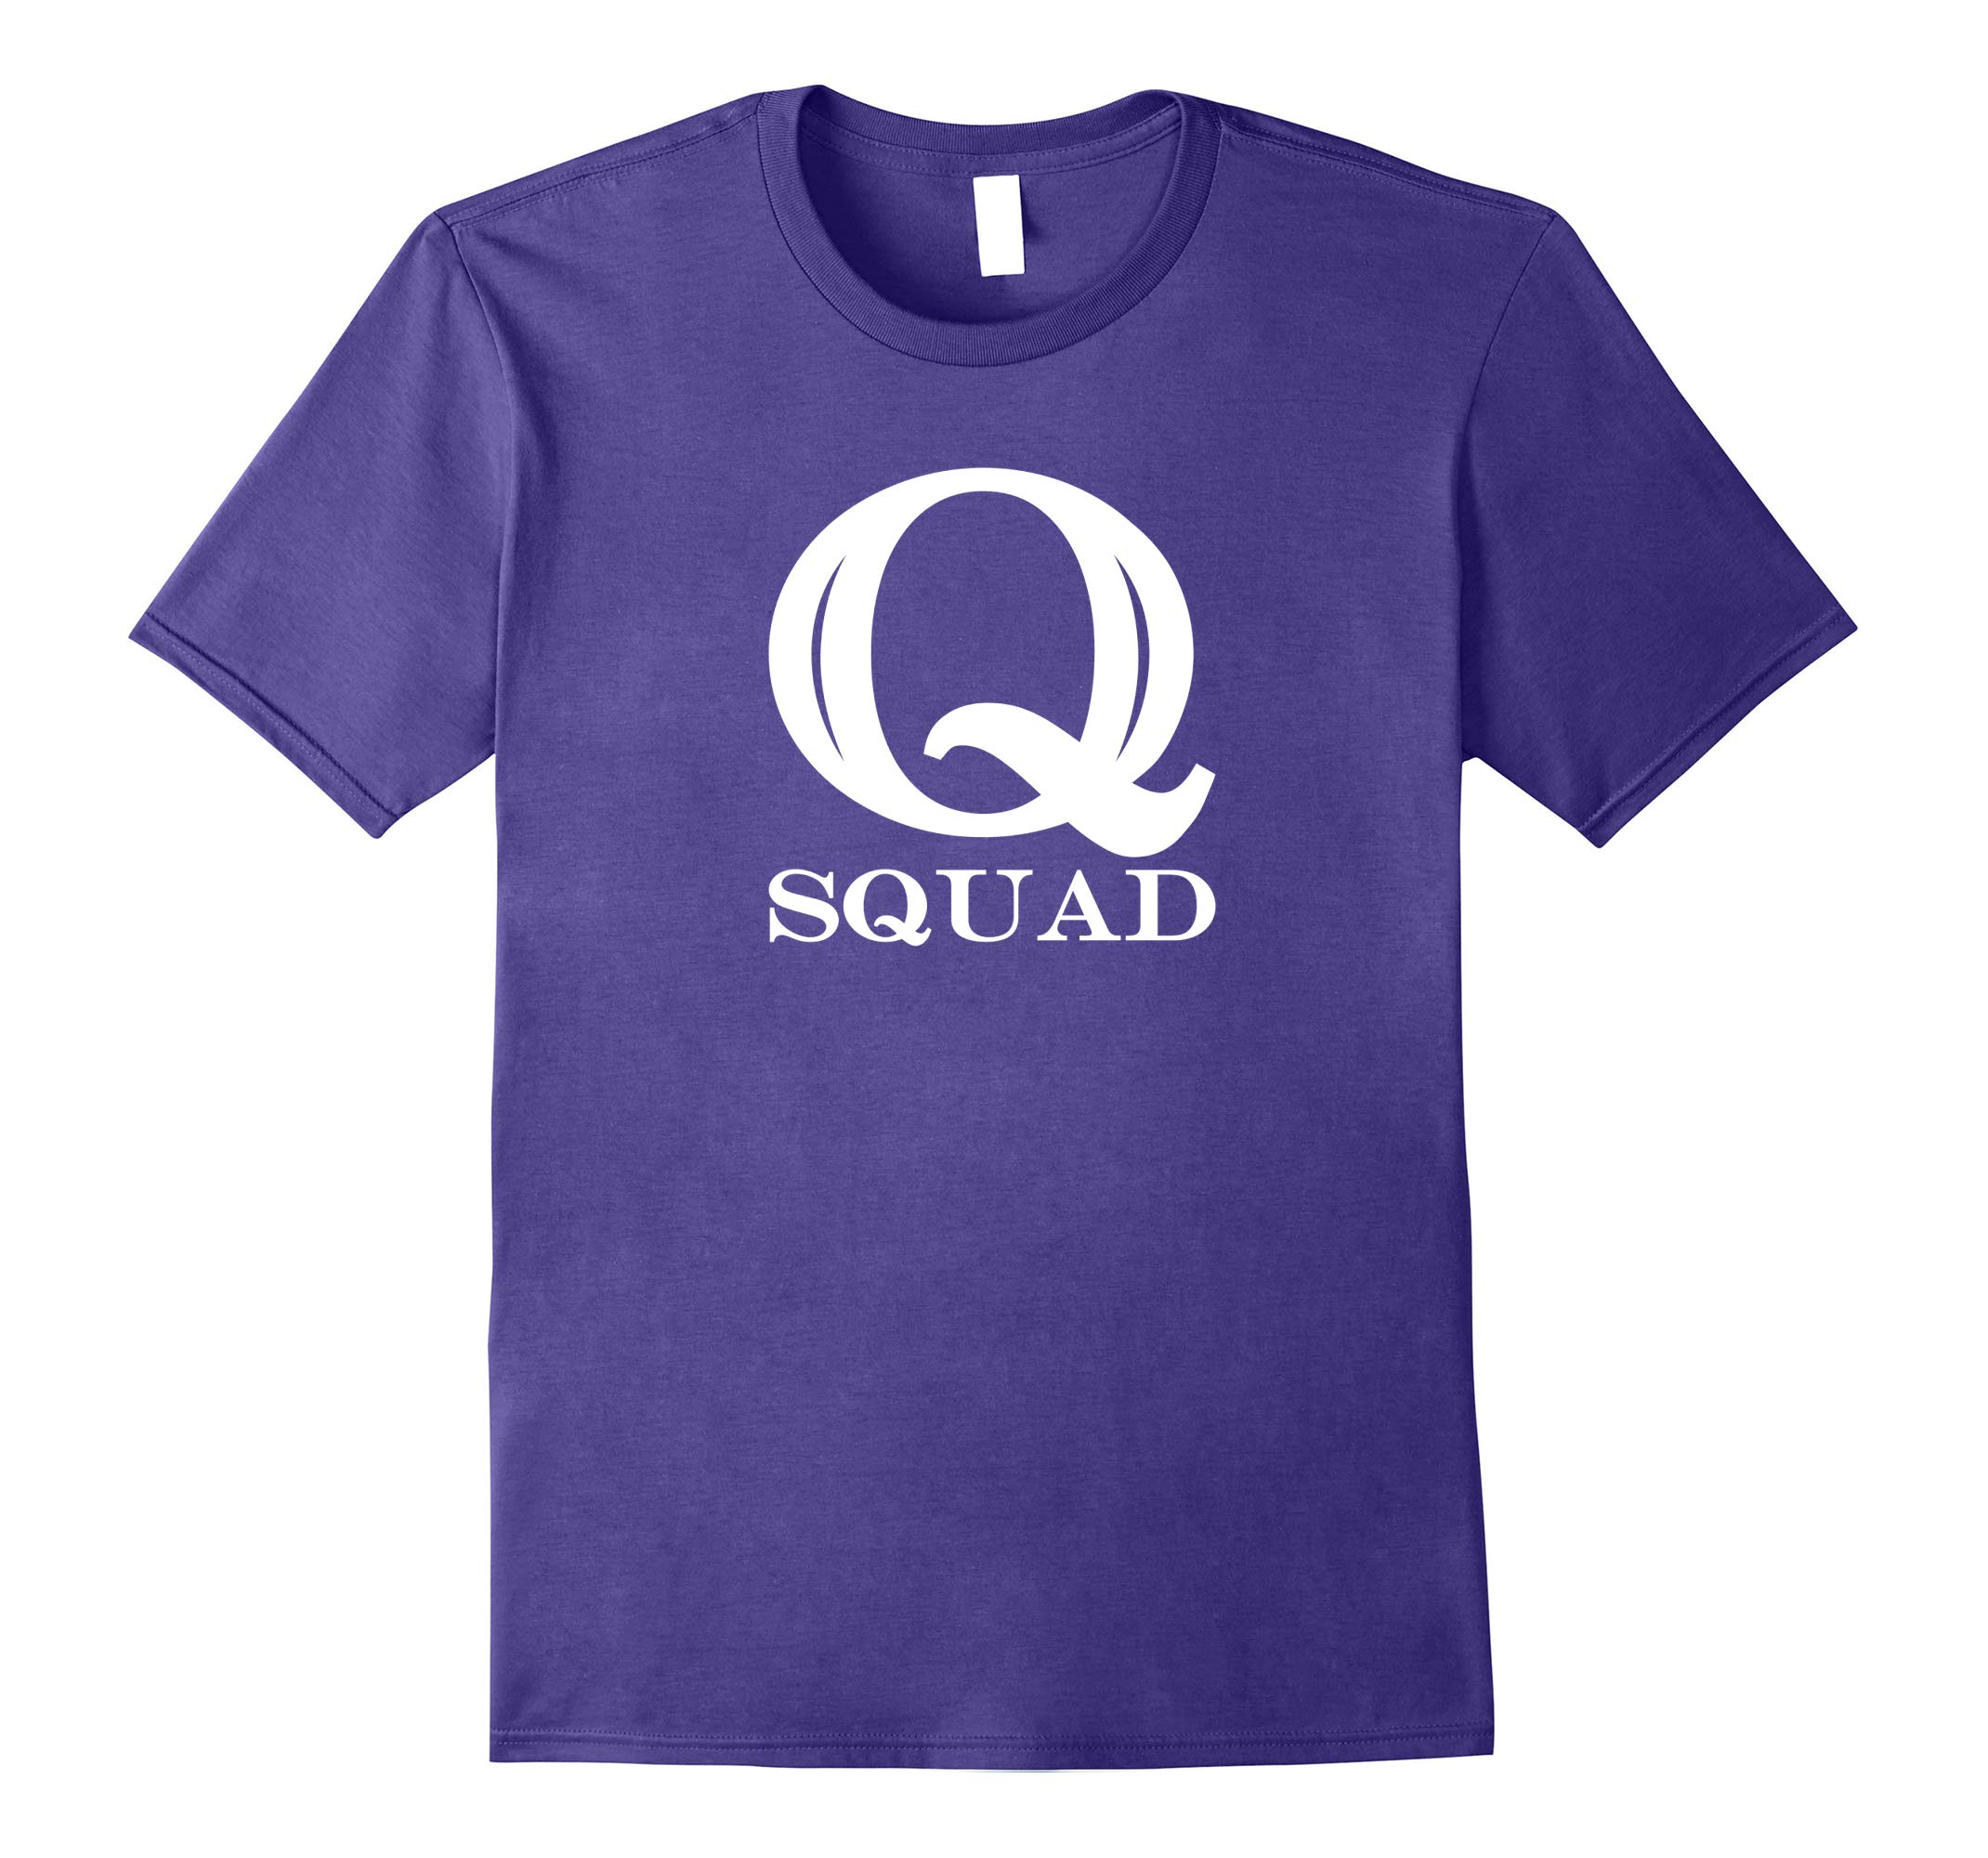 Q Squad T-Shirt For Q Anon Fans-RT